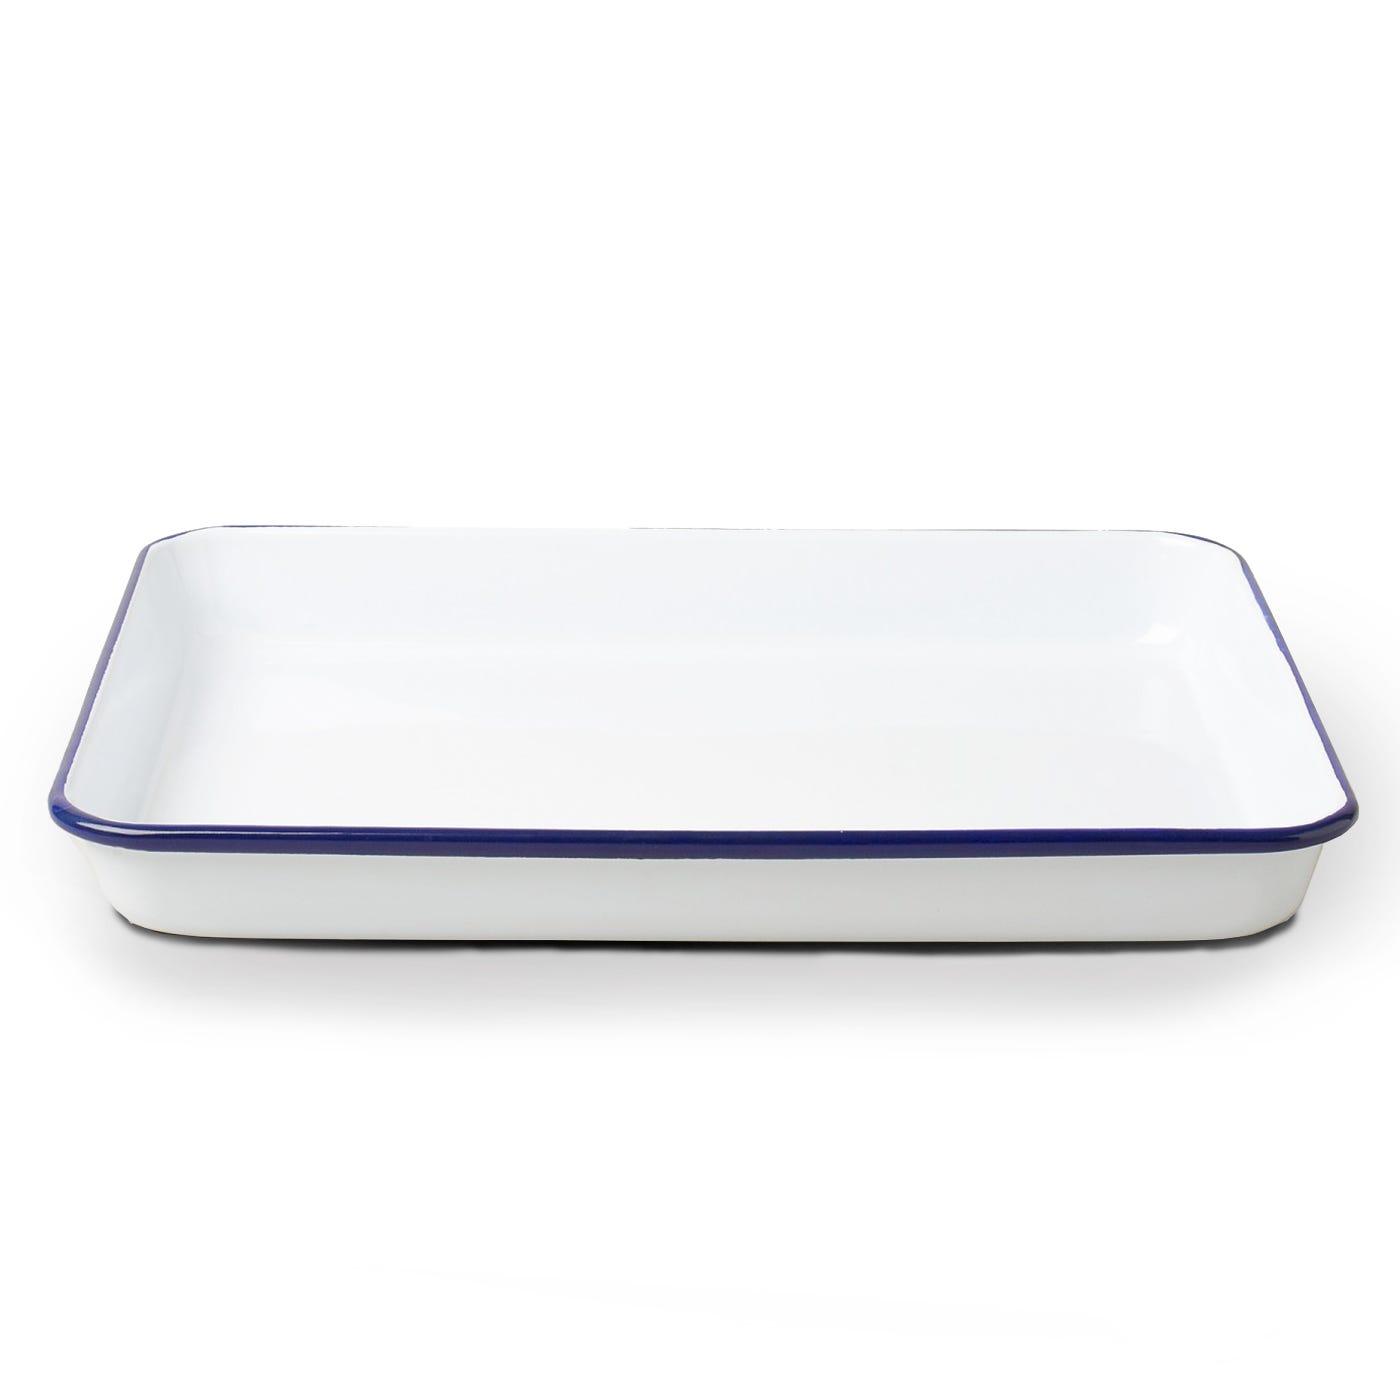 Falcon Enamelware Tray White & Blue